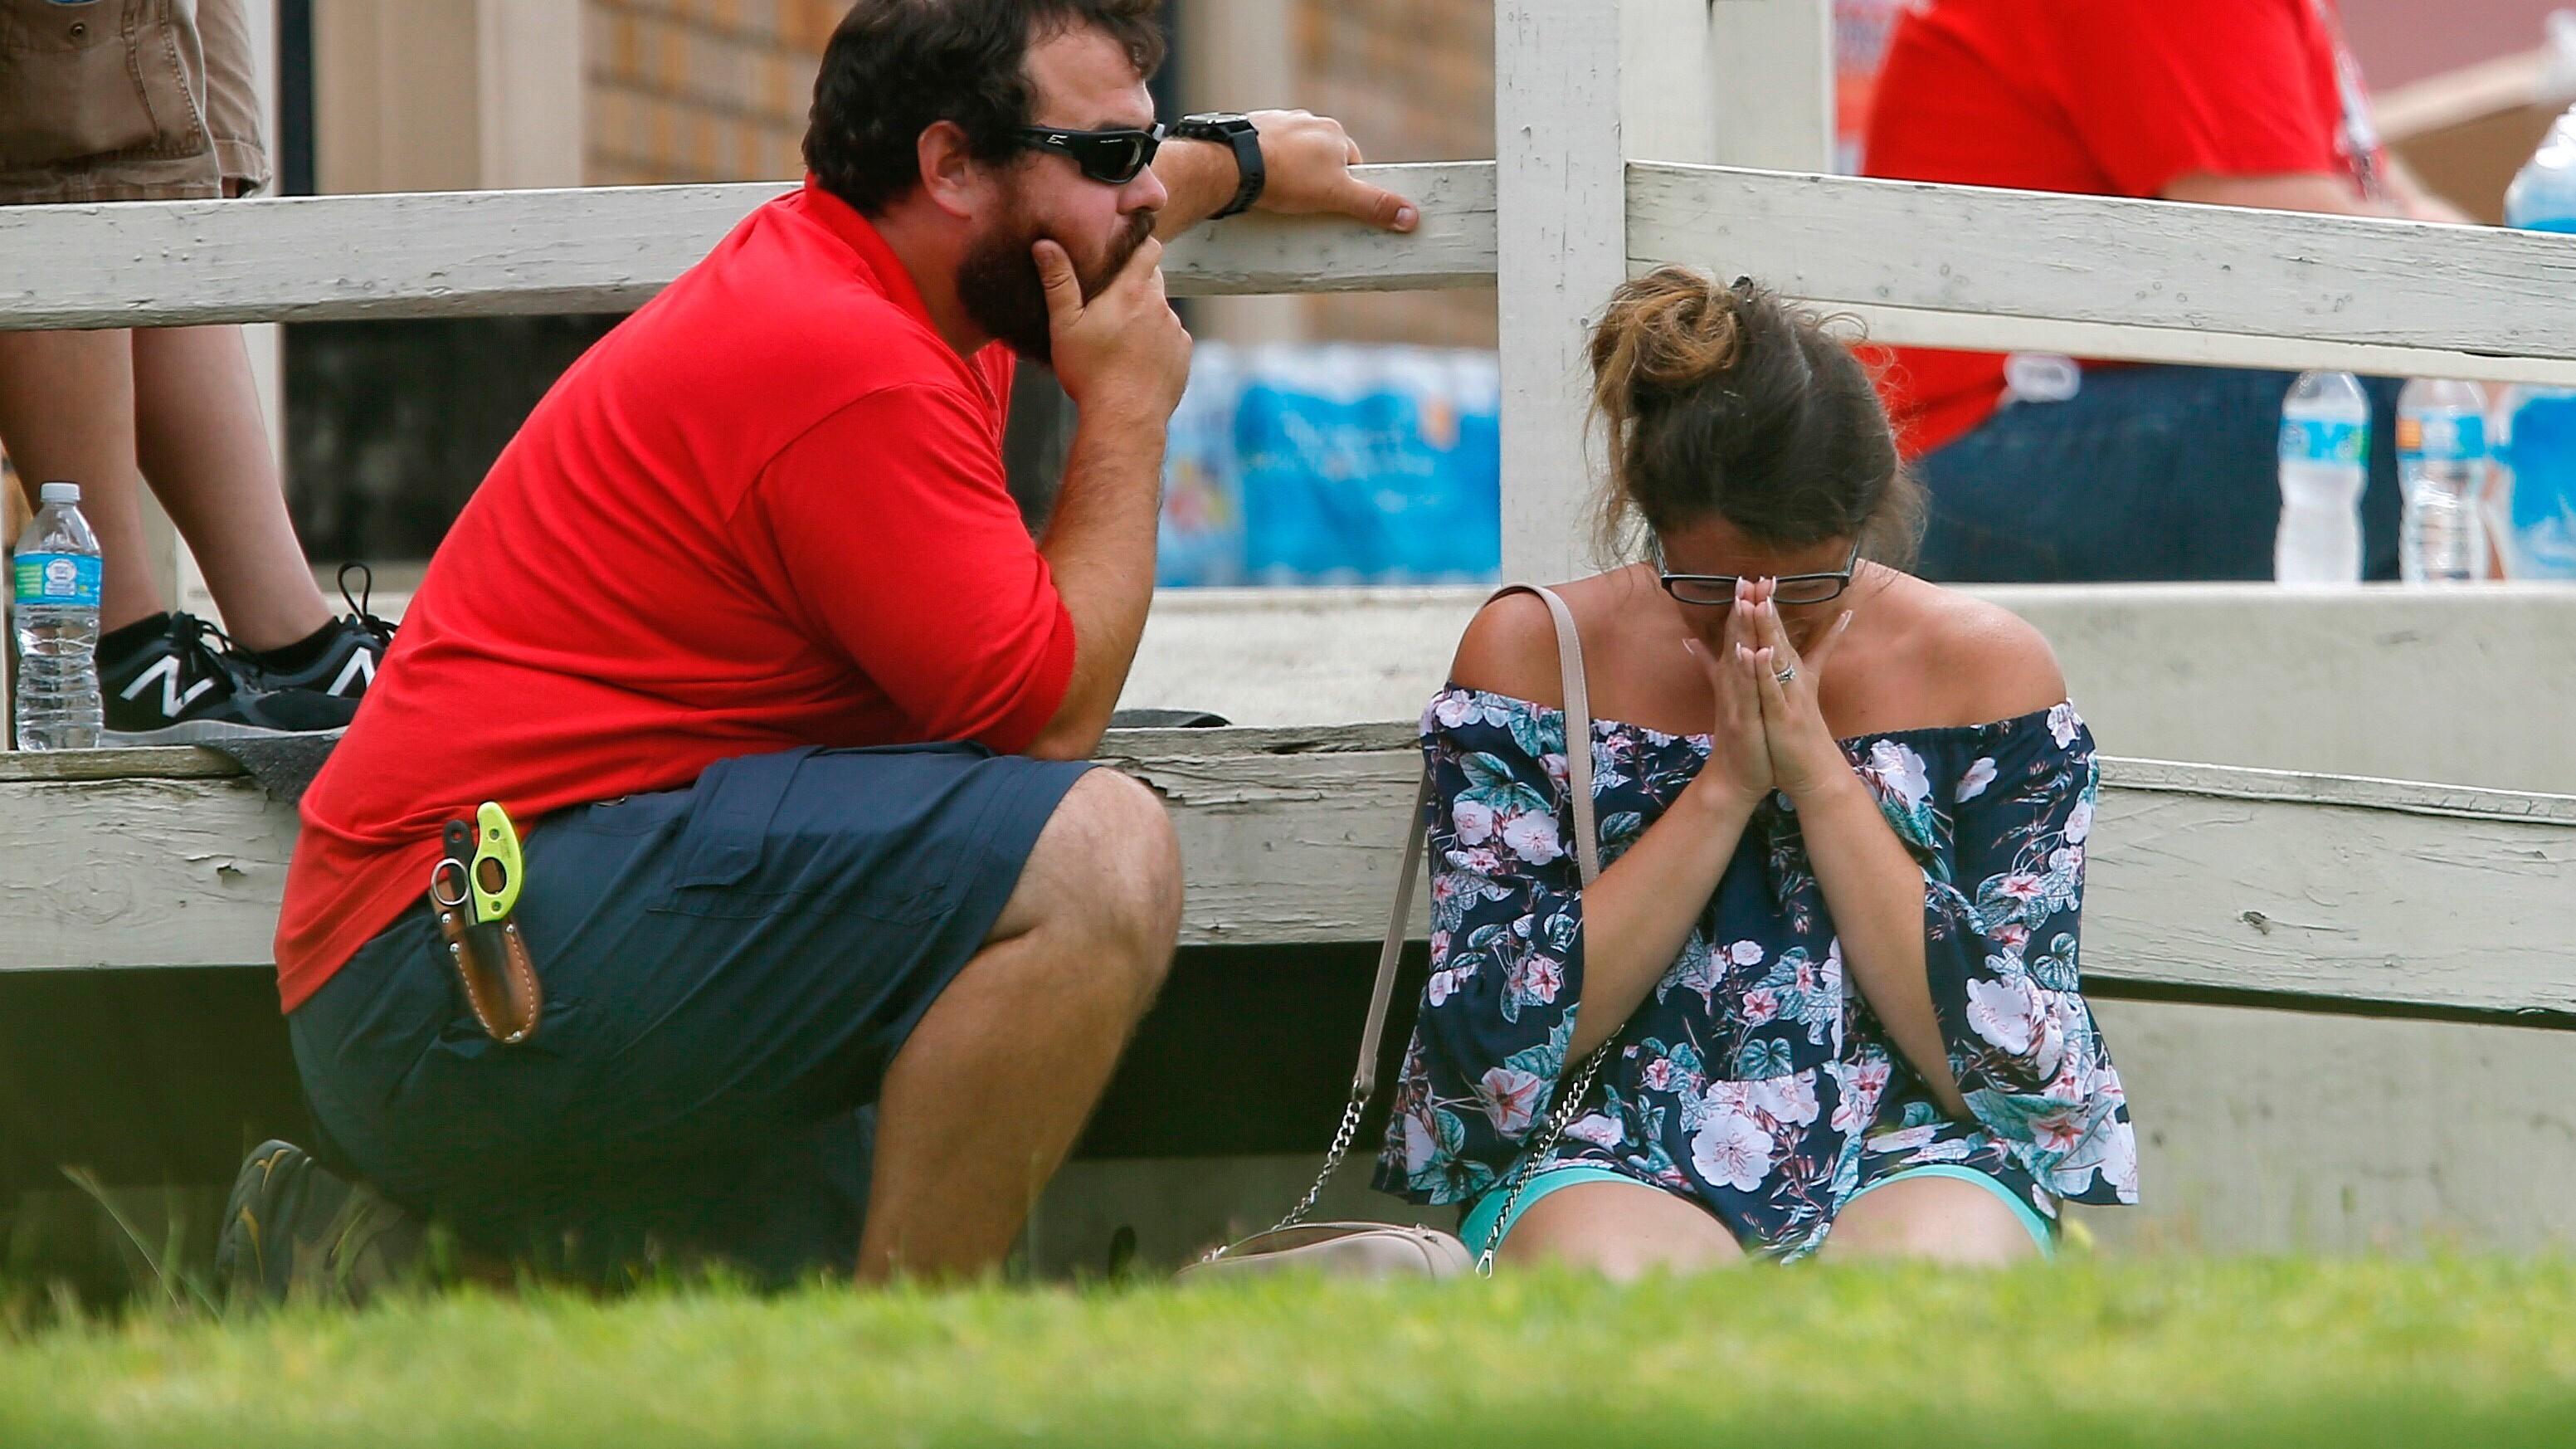 Santa Fe News >> 10 Killed In Santa Fe Texas High School Shooting Vice News